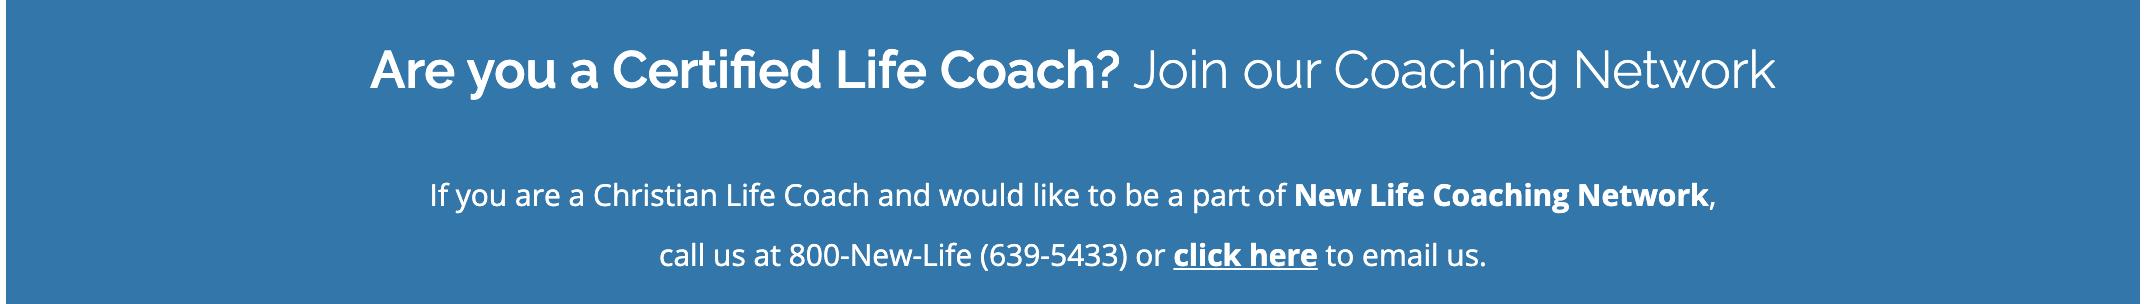 New Life Coaching Network